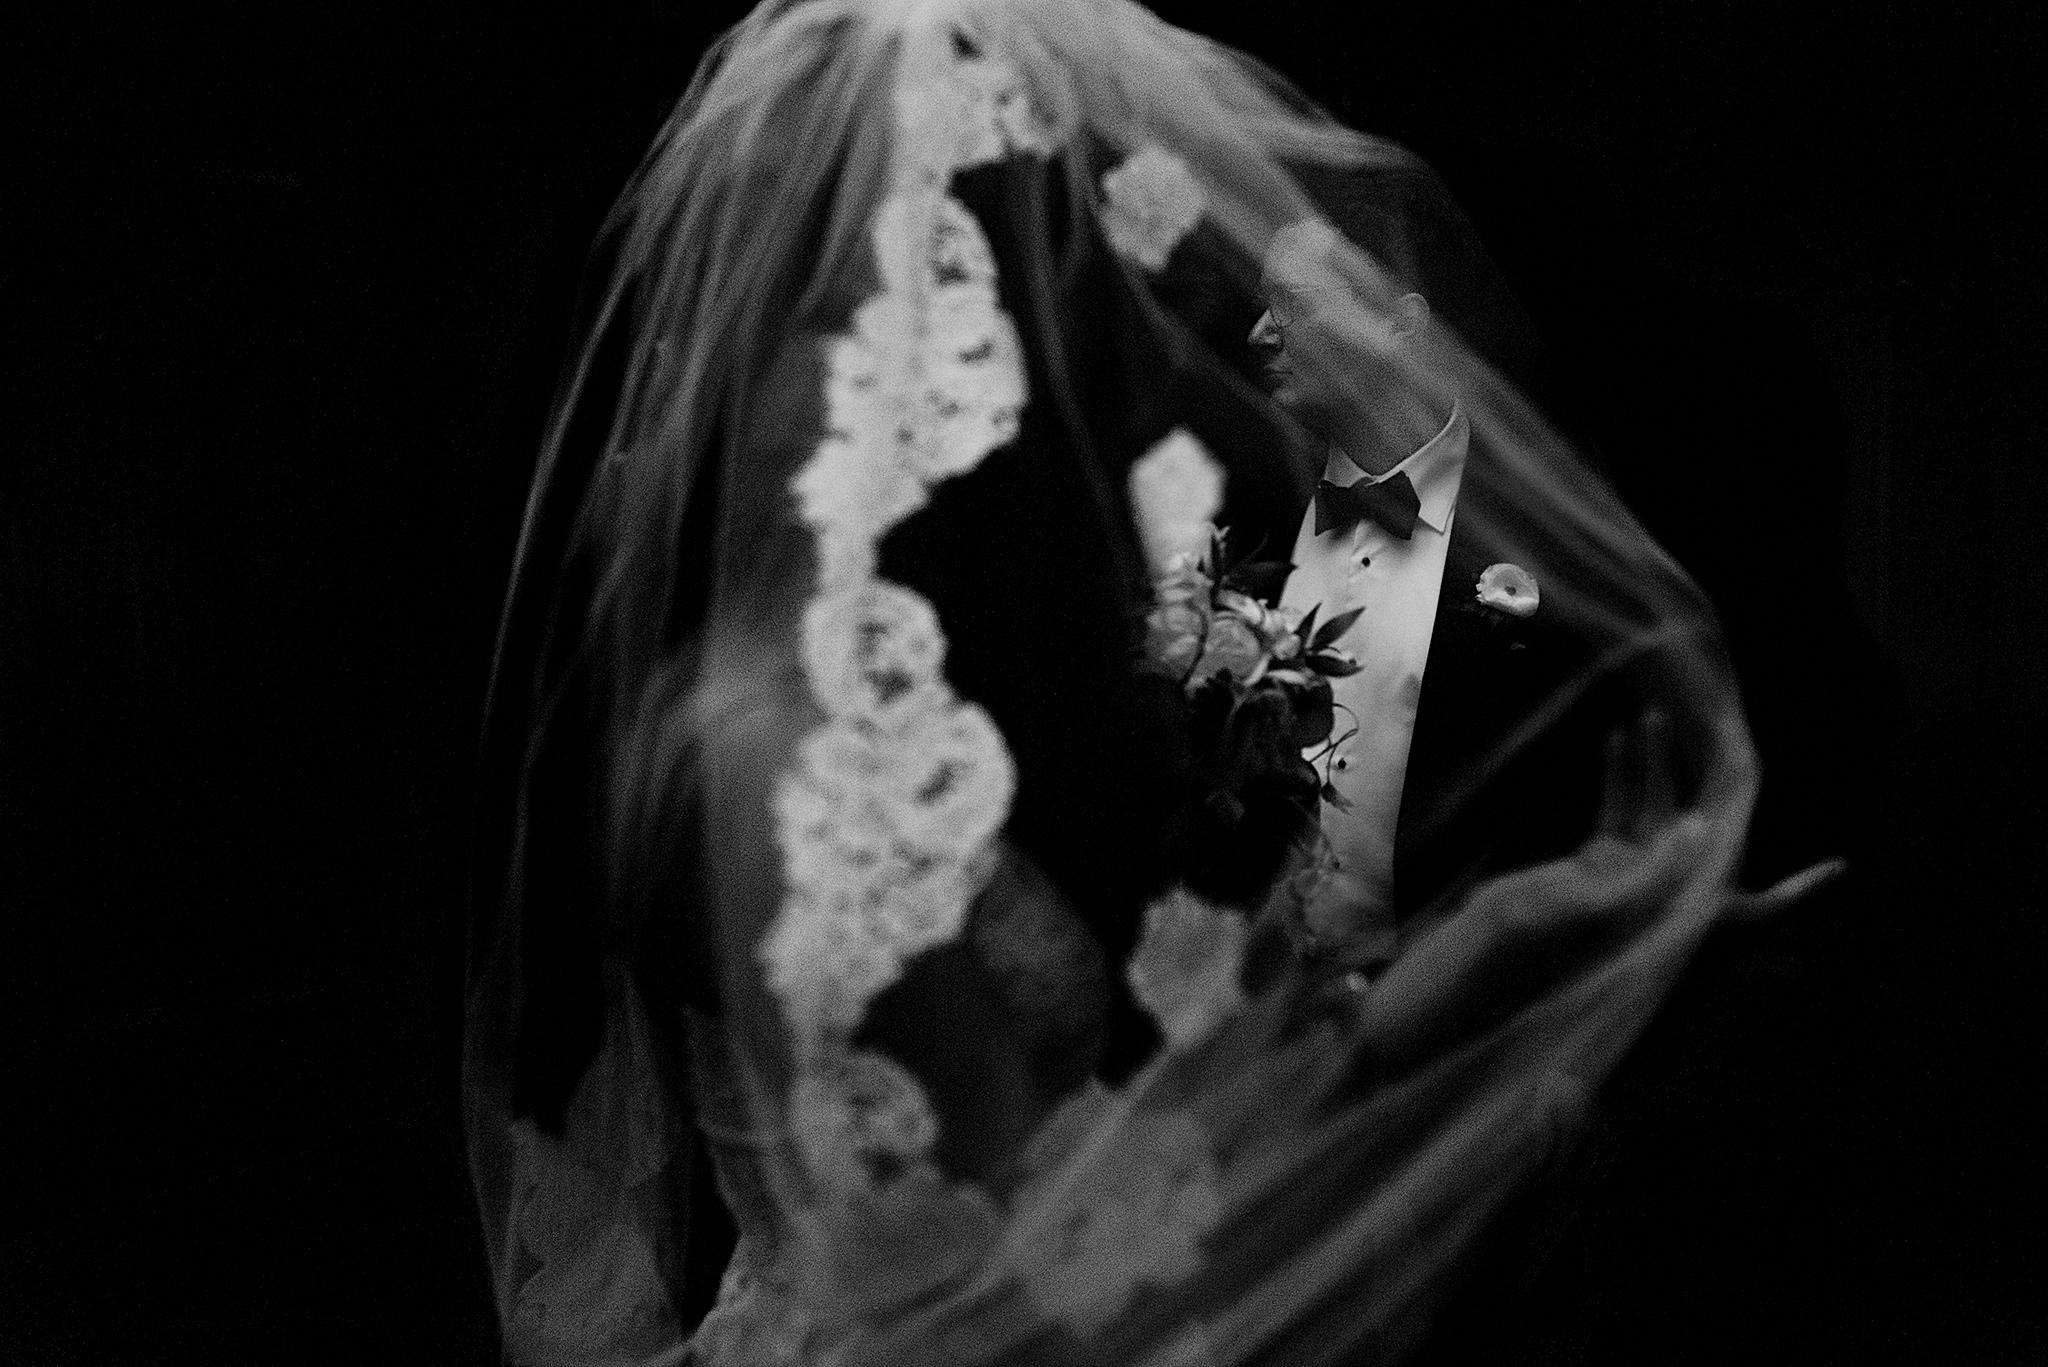 Joseph West Photography